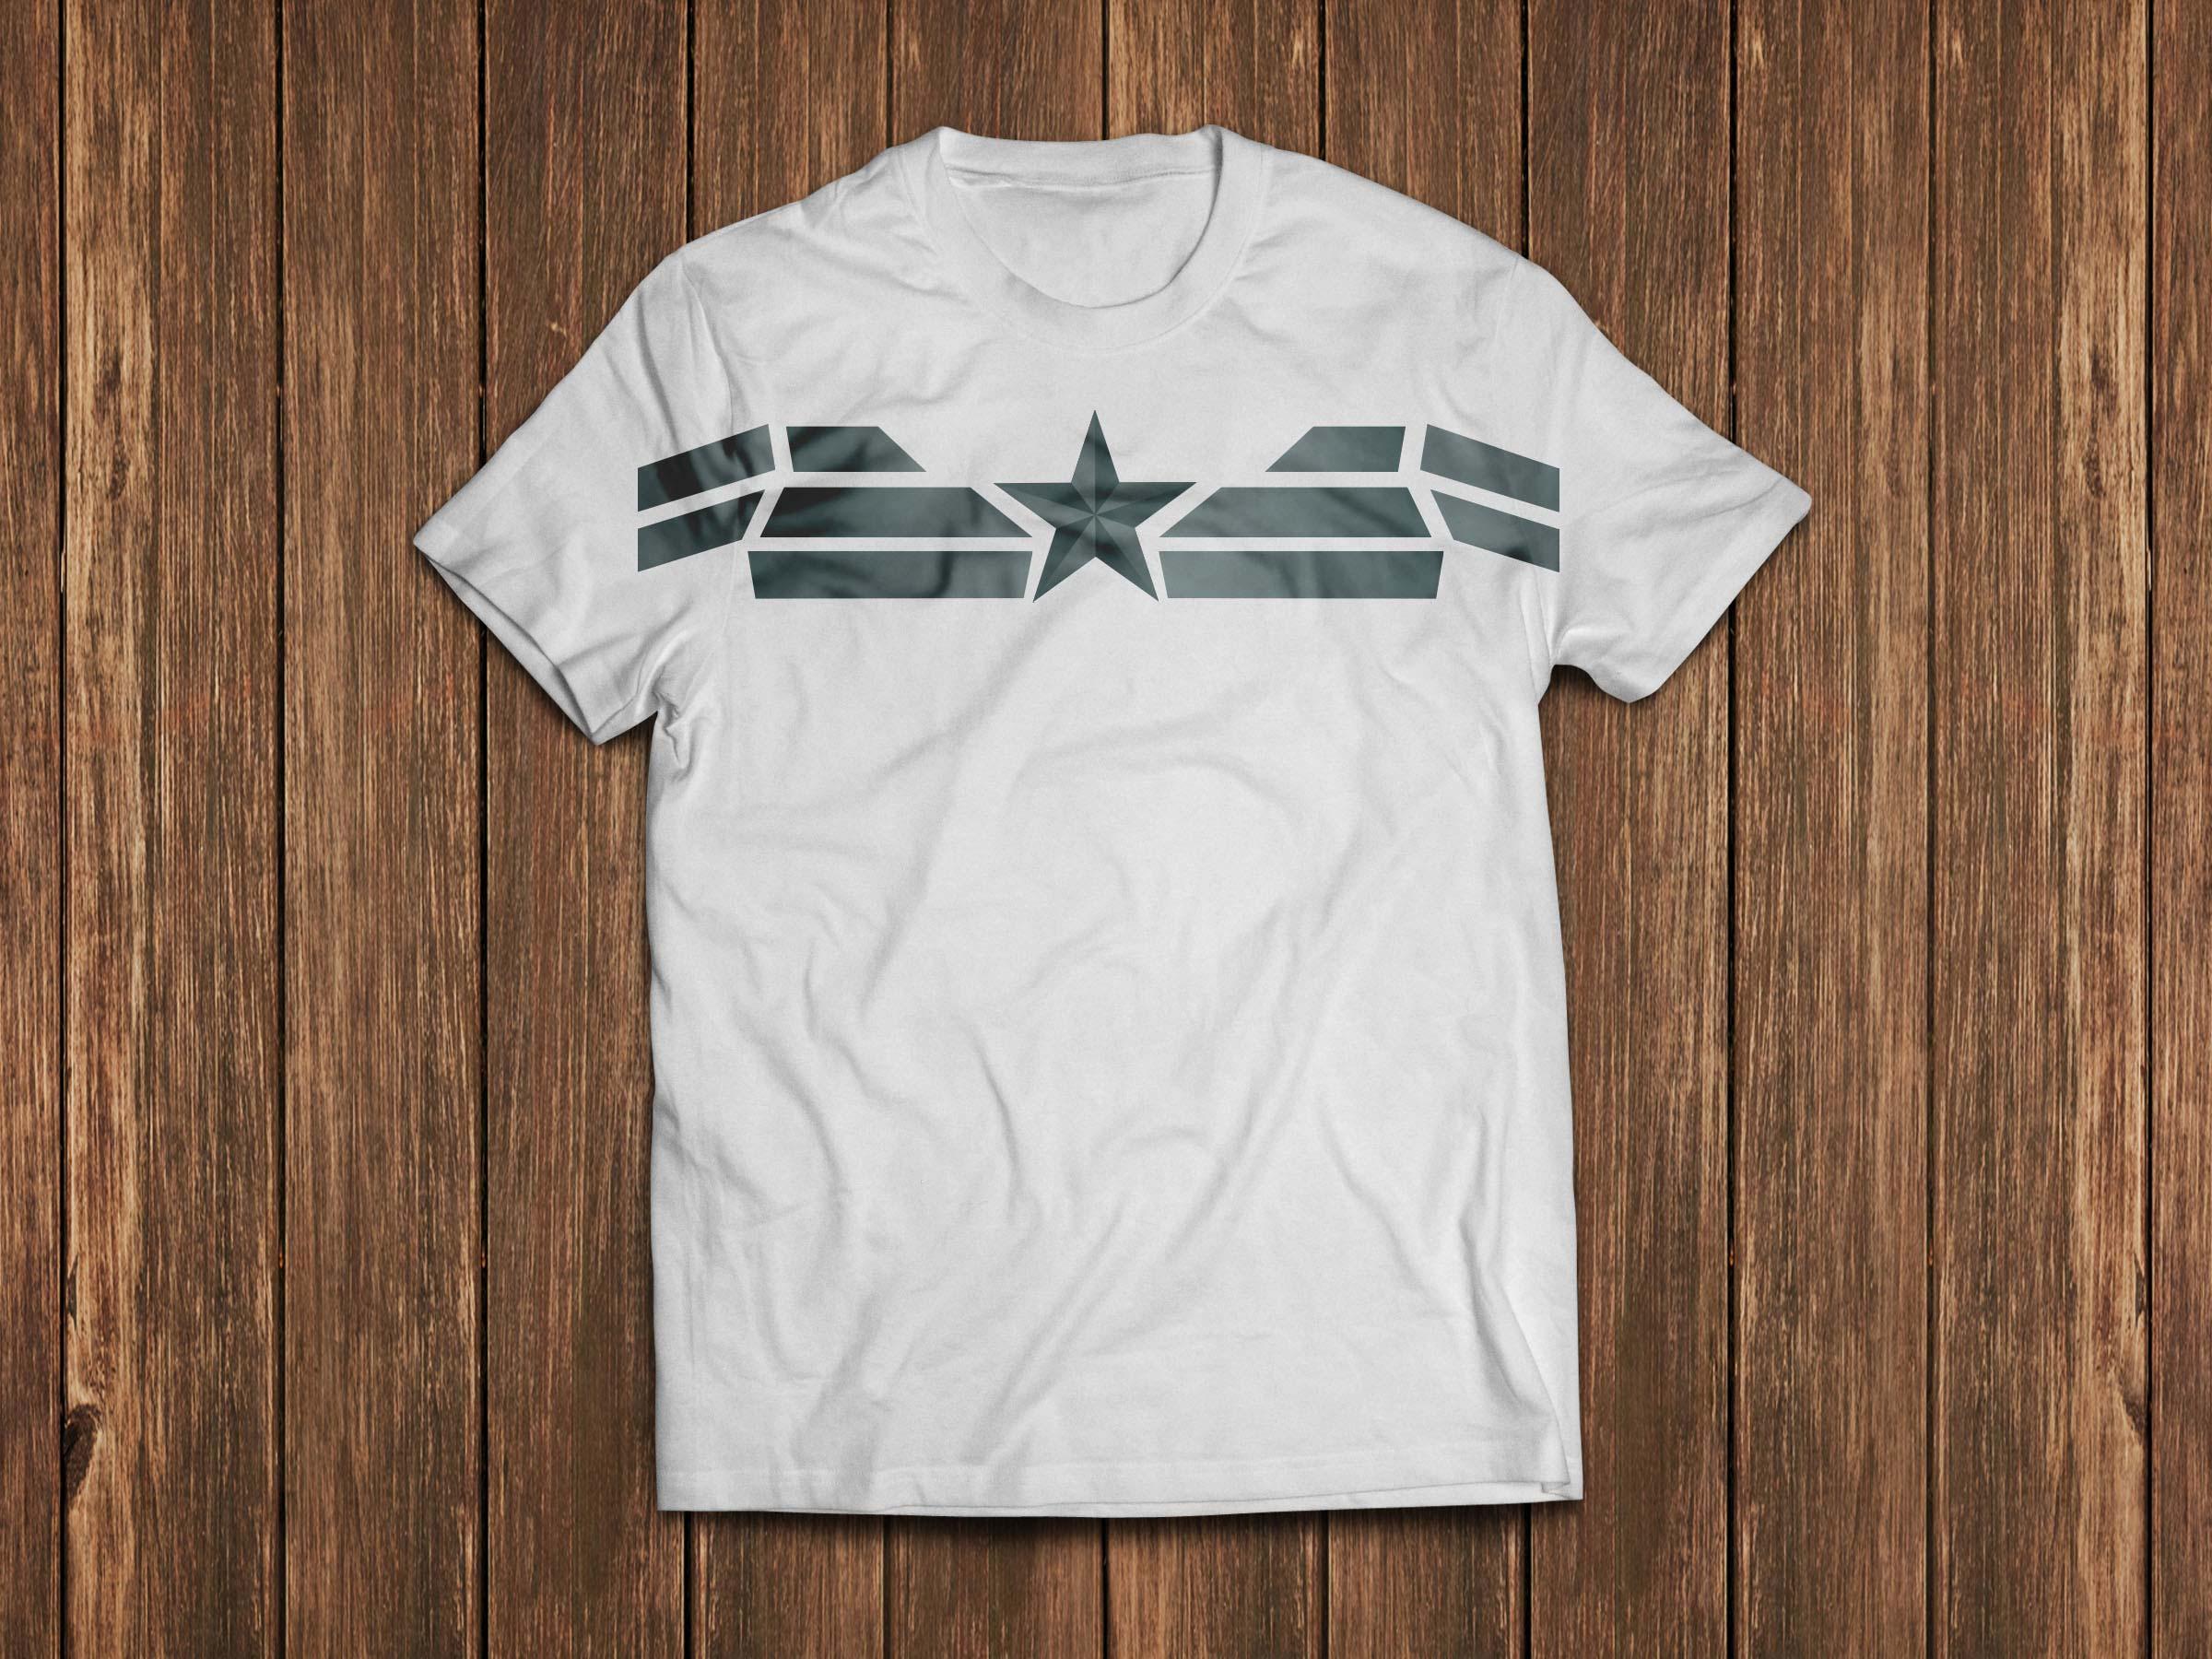 T Shirt Design For Man